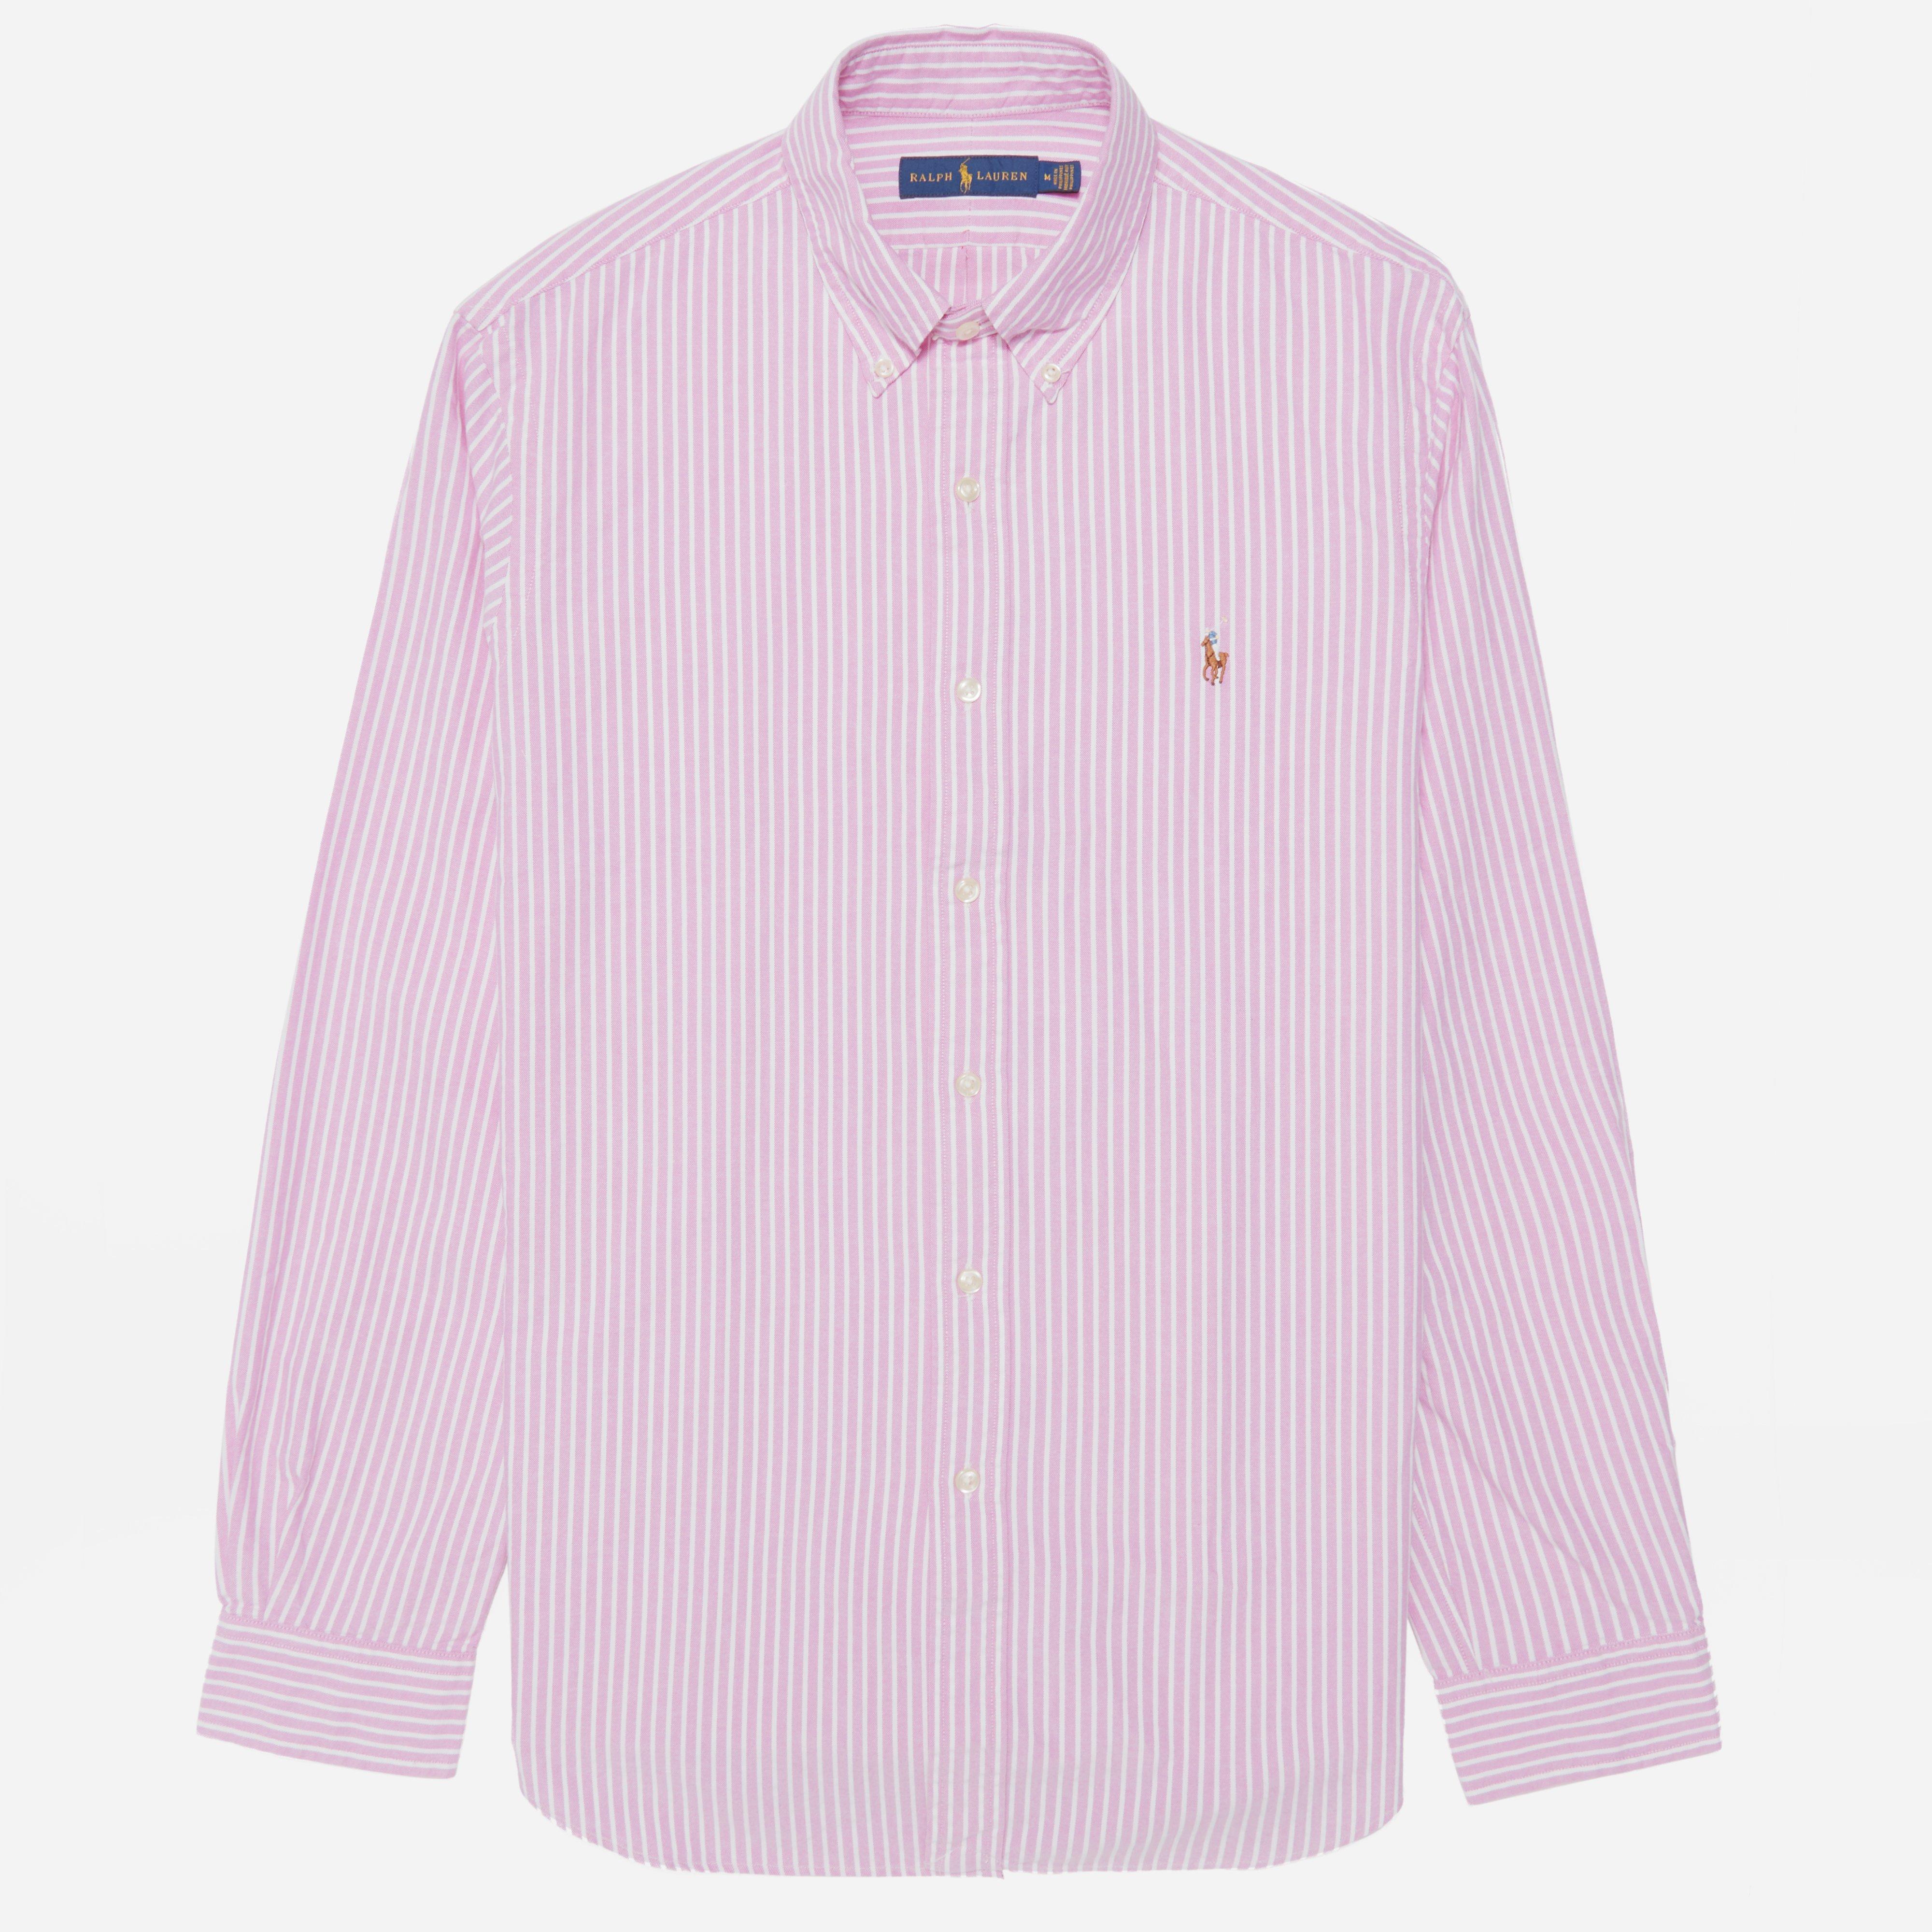 6fdf27c1f Pink Ralph Lauren Button Down Shirt - Cotswold Hire